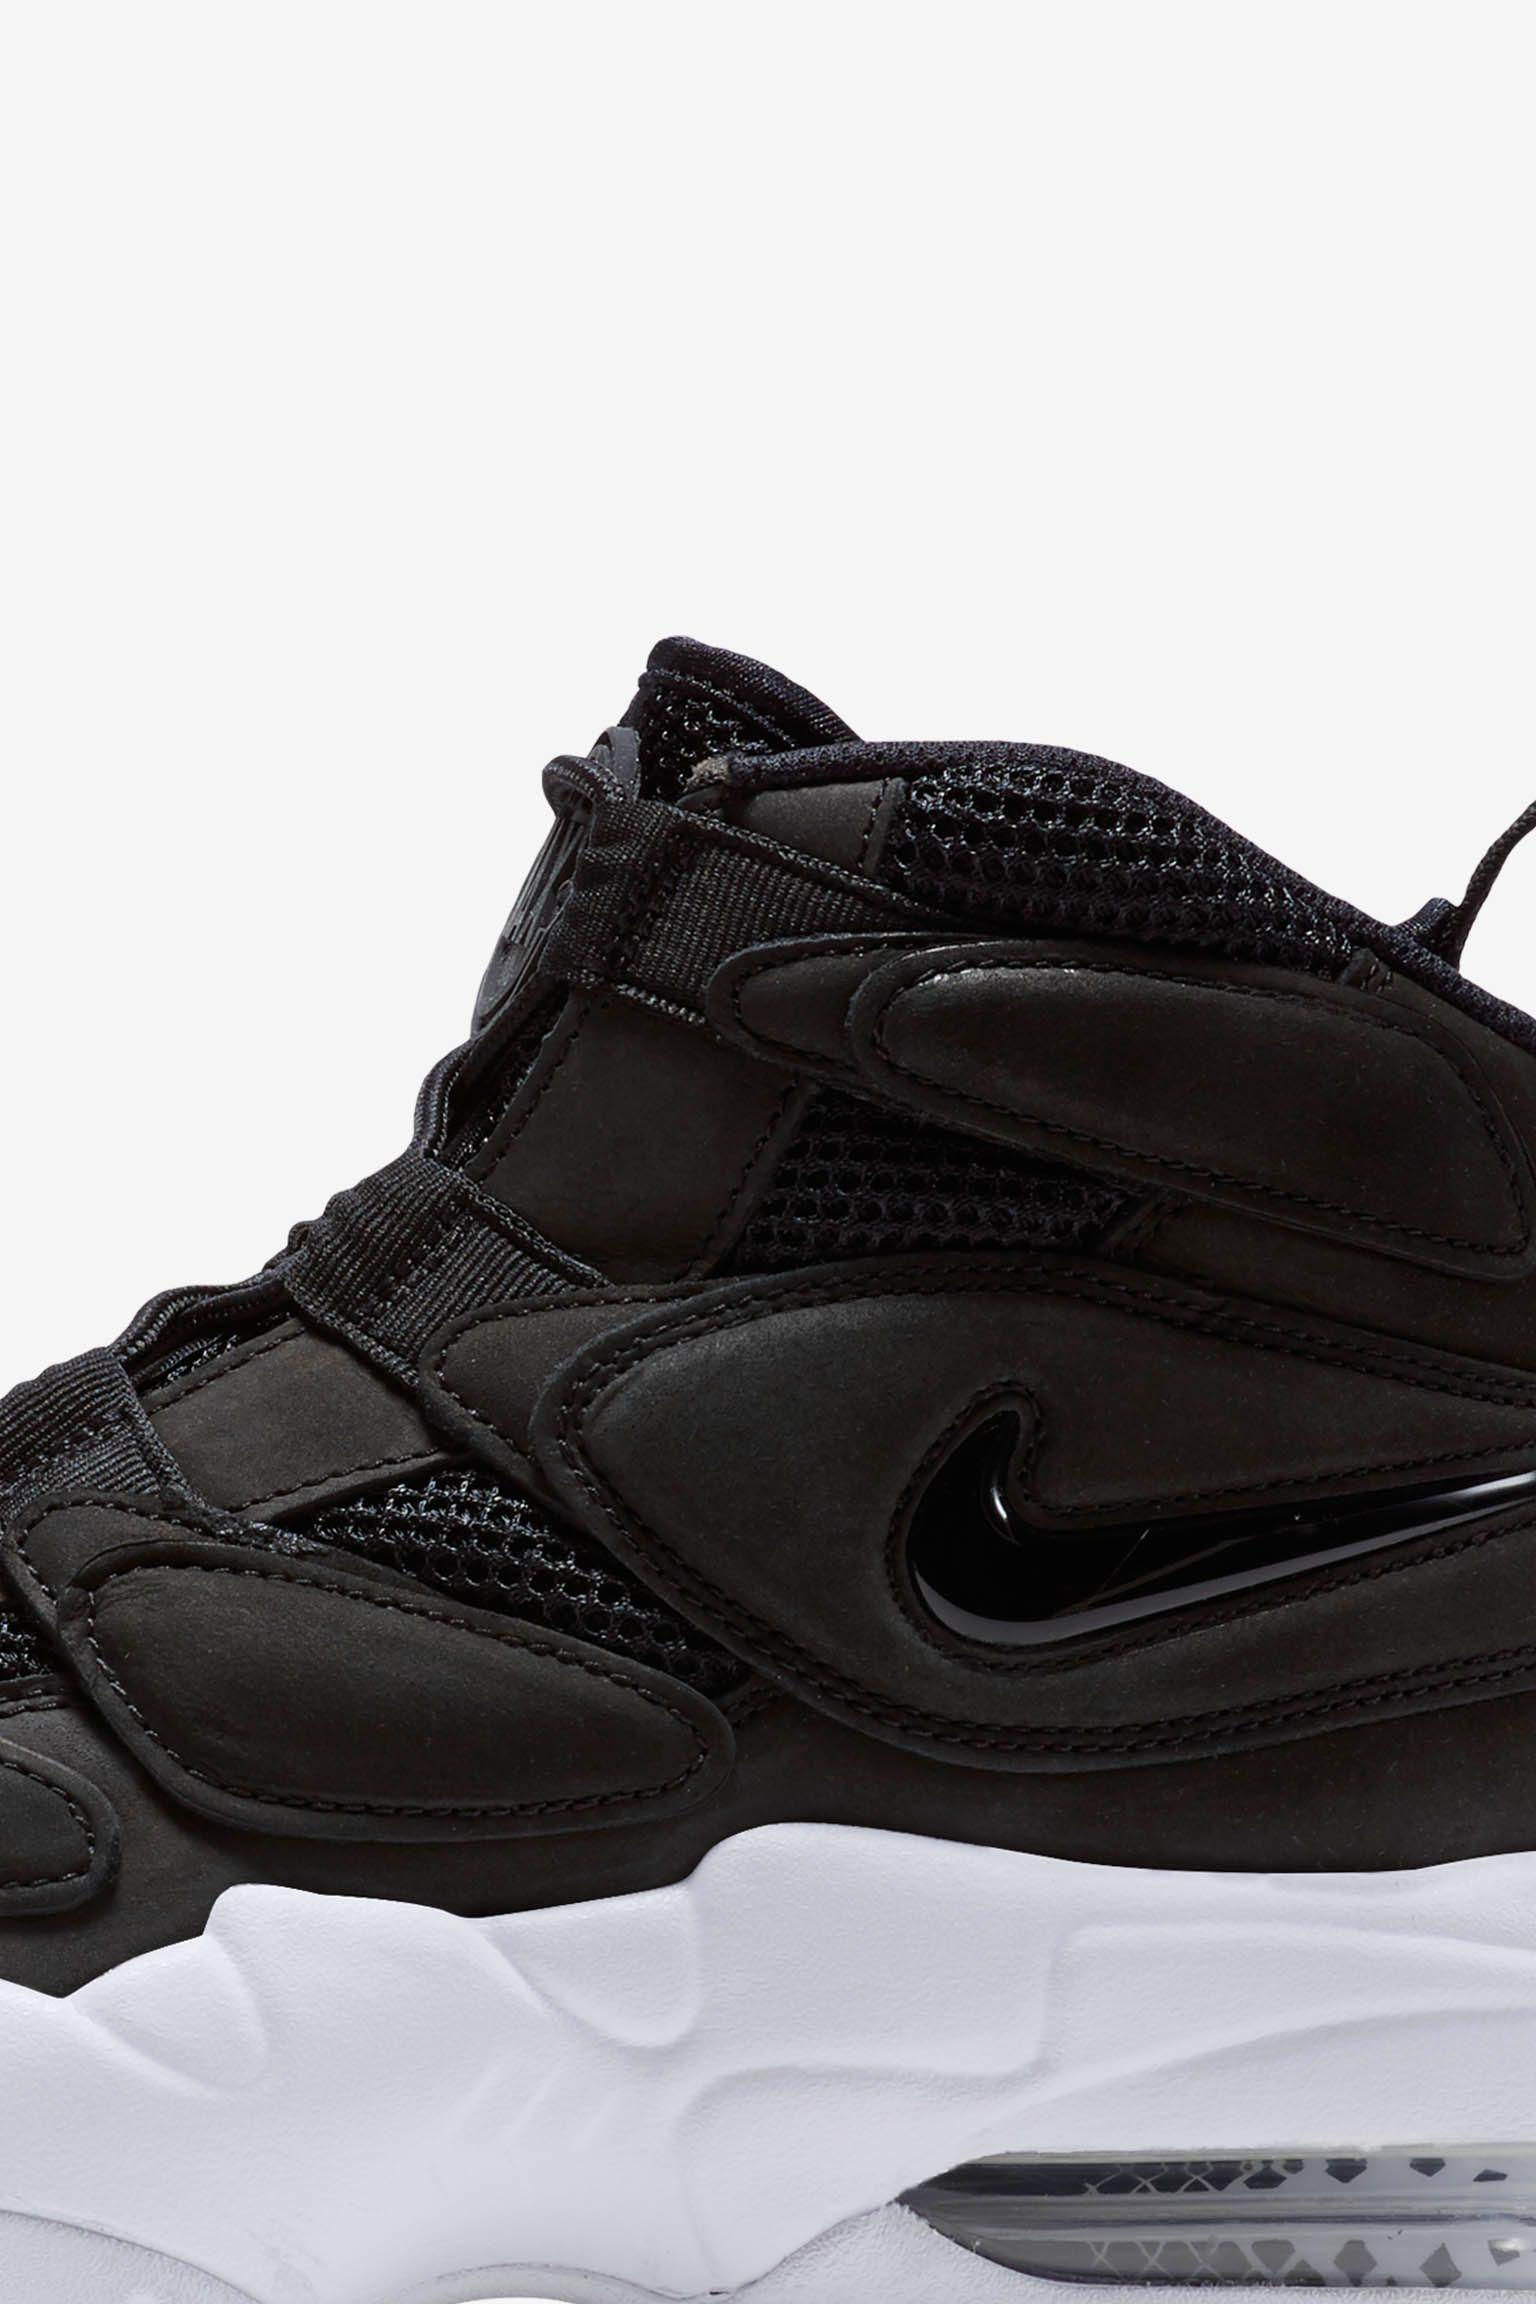 Nike Air Max2 Uptempo 'Black & White'